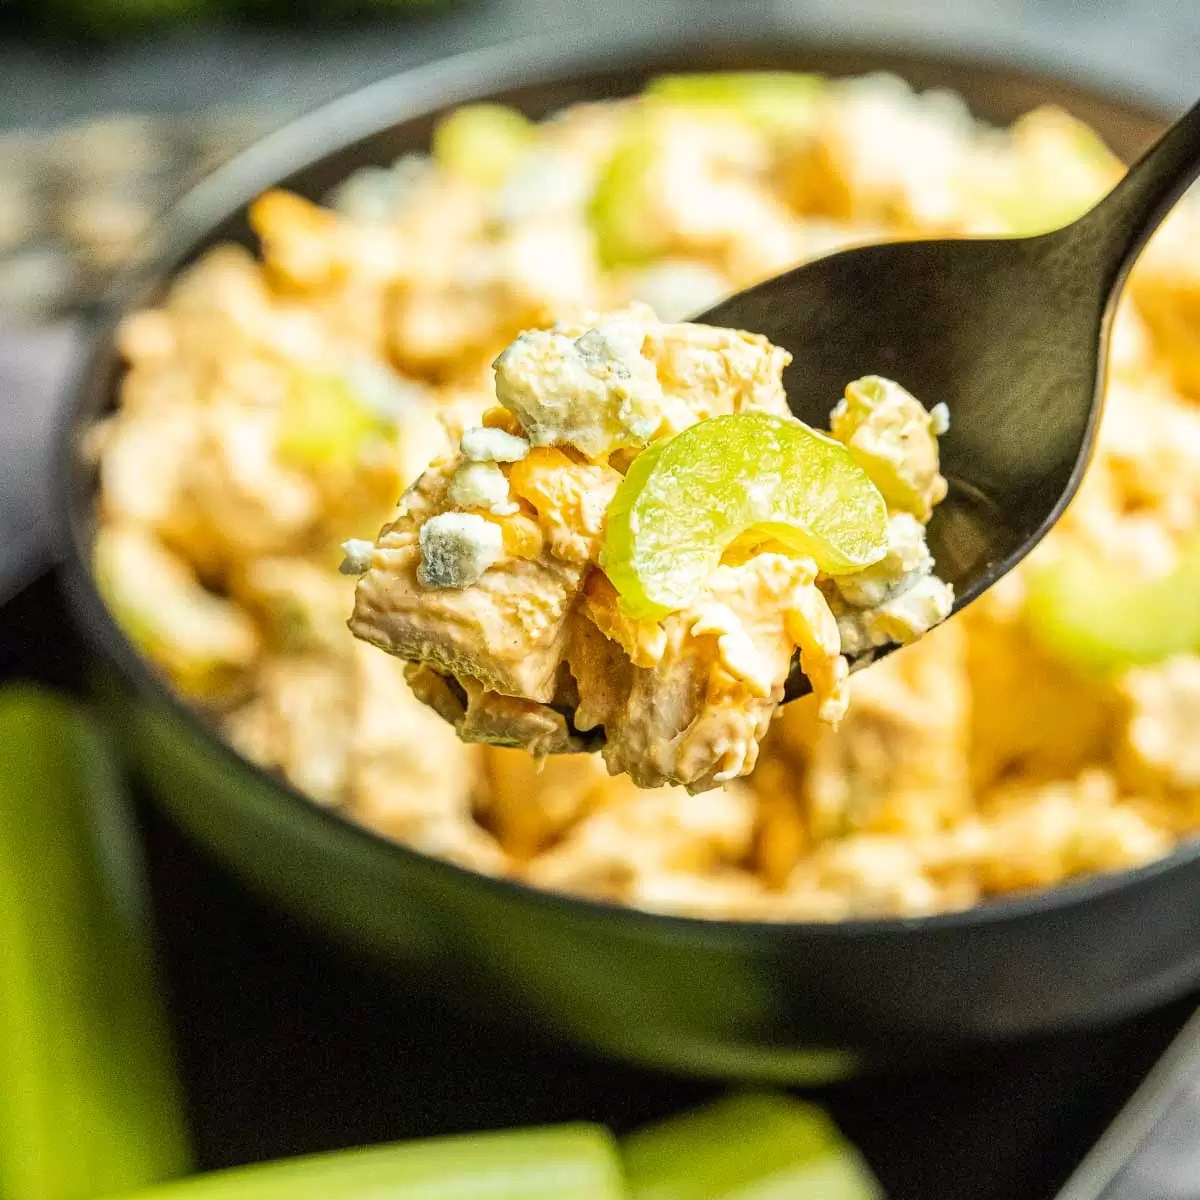 Buffalo Chicken Salad on a spoon